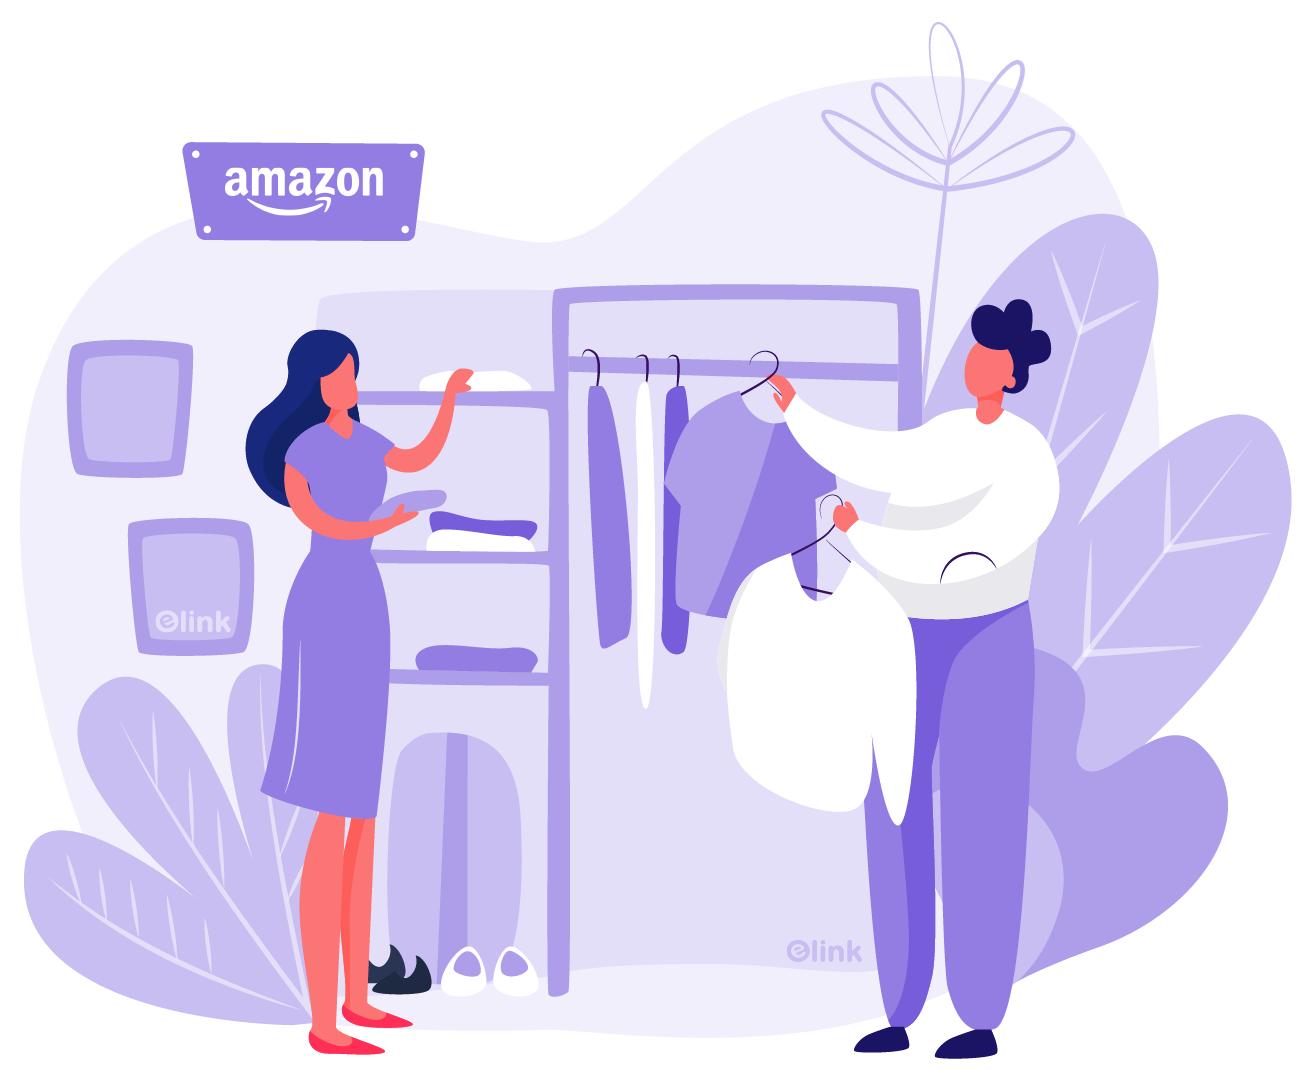 Amazon reseller as a small business idea